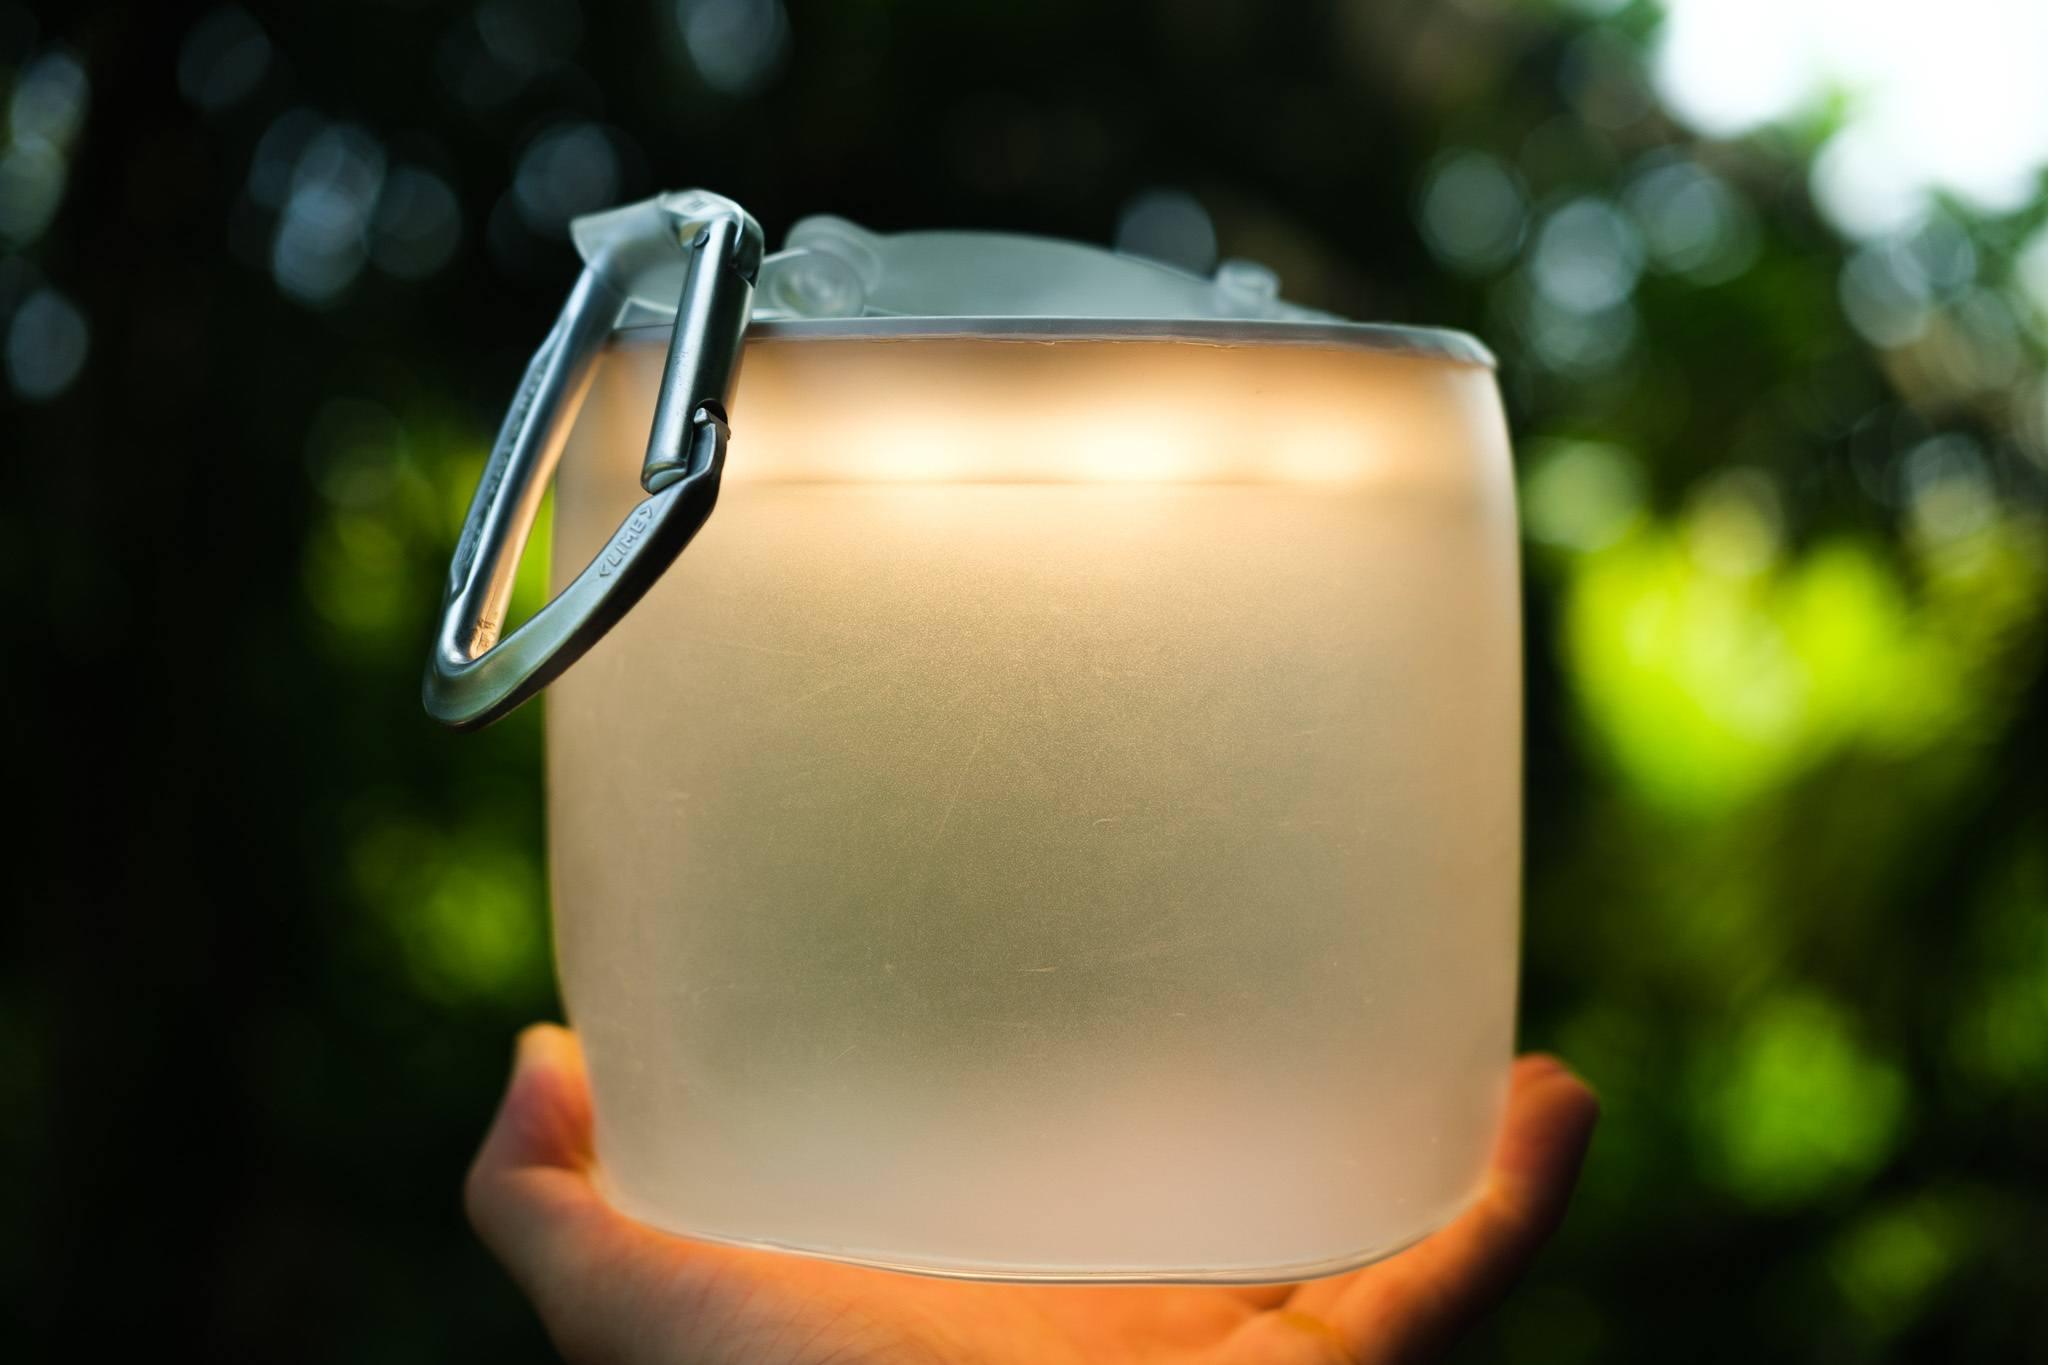 luci solar light